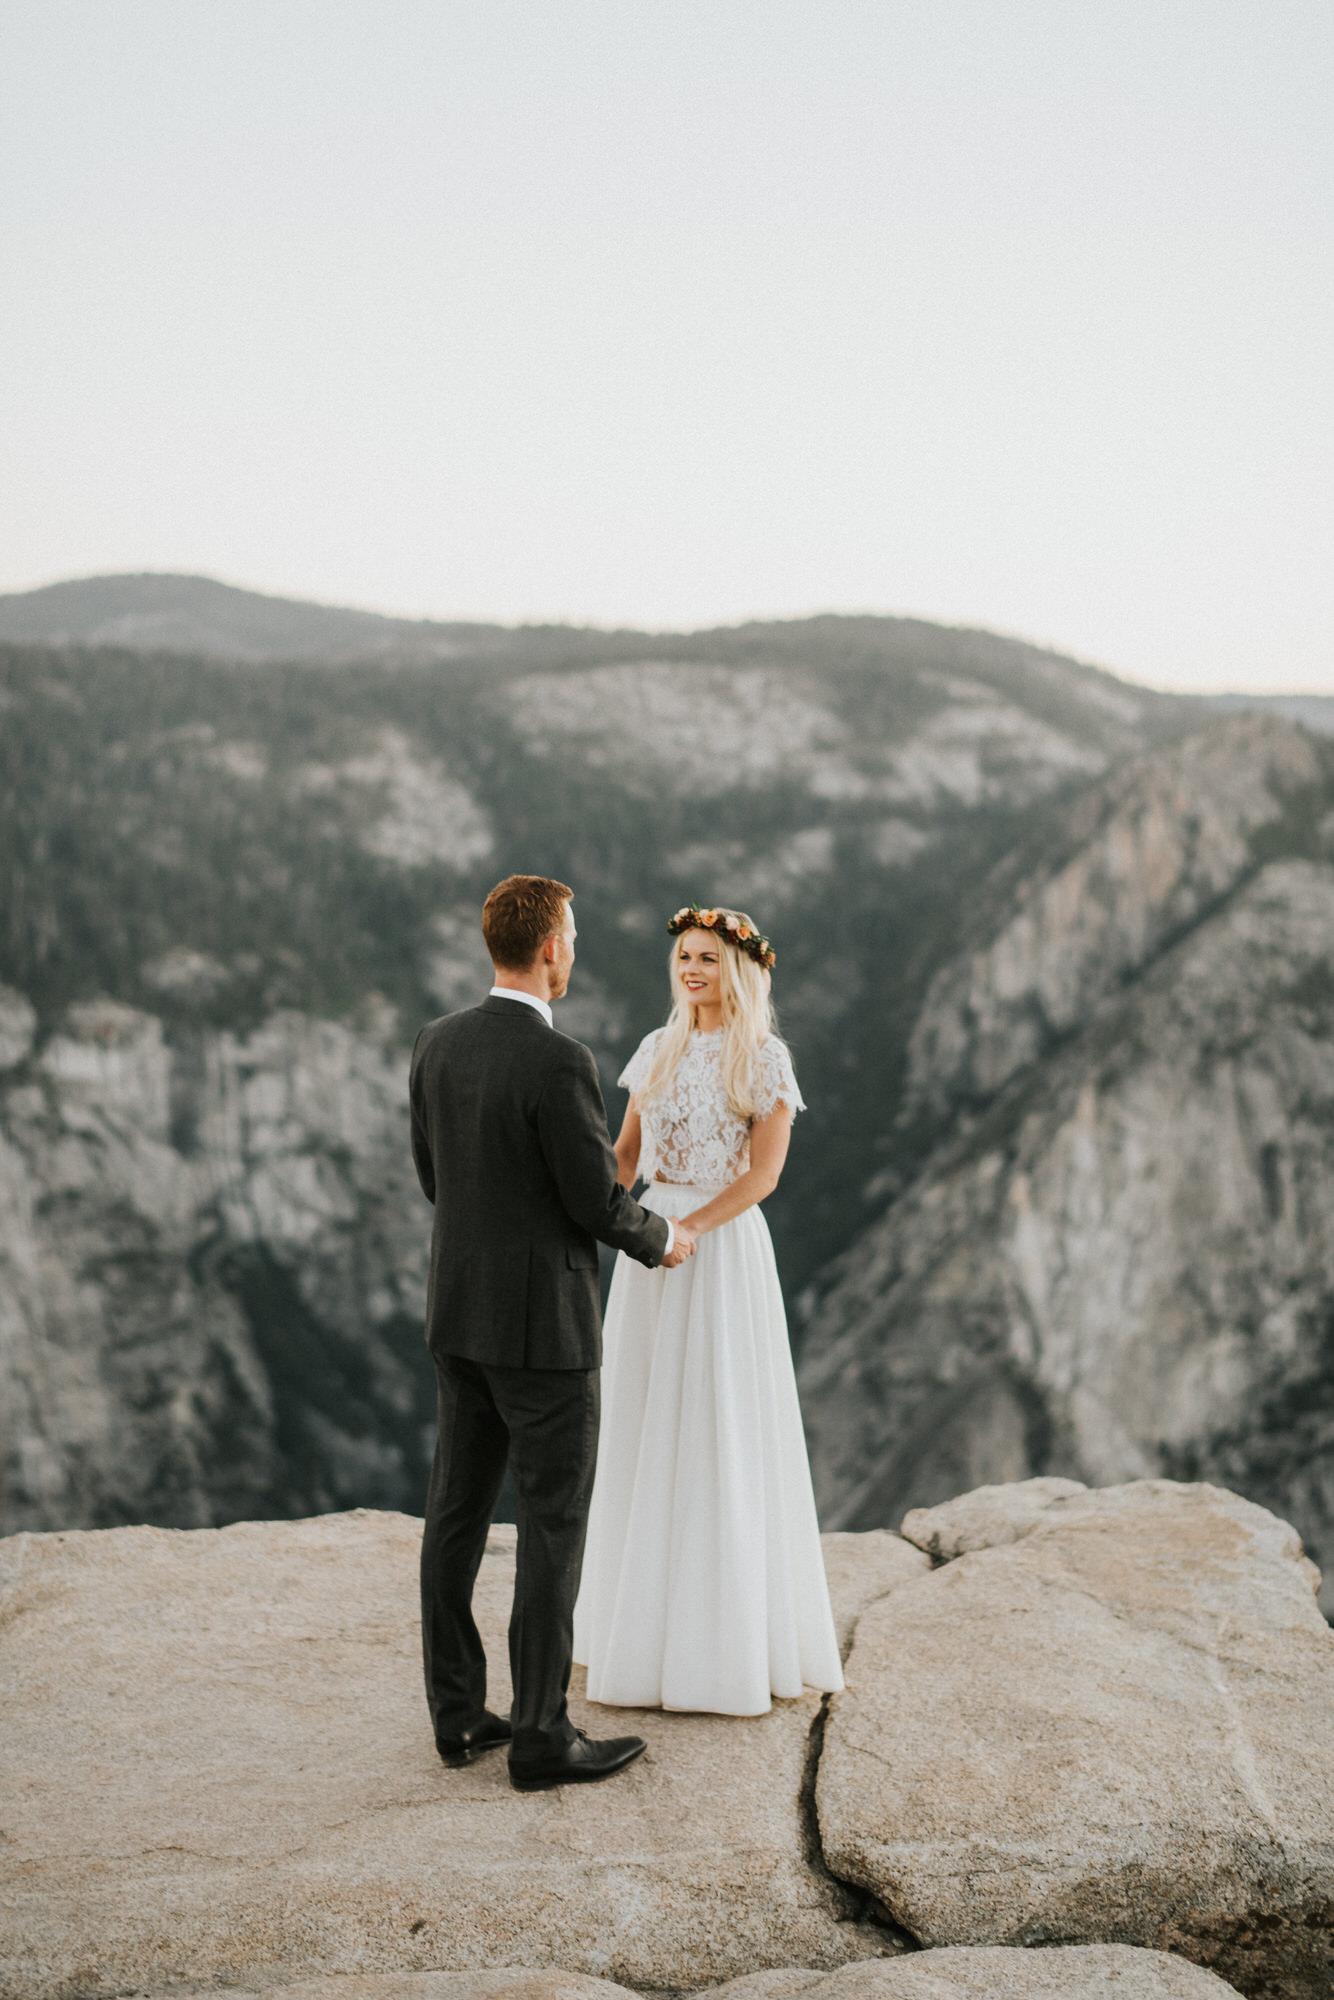 Sunrise Yosemite National Park Elopement at Taft Point